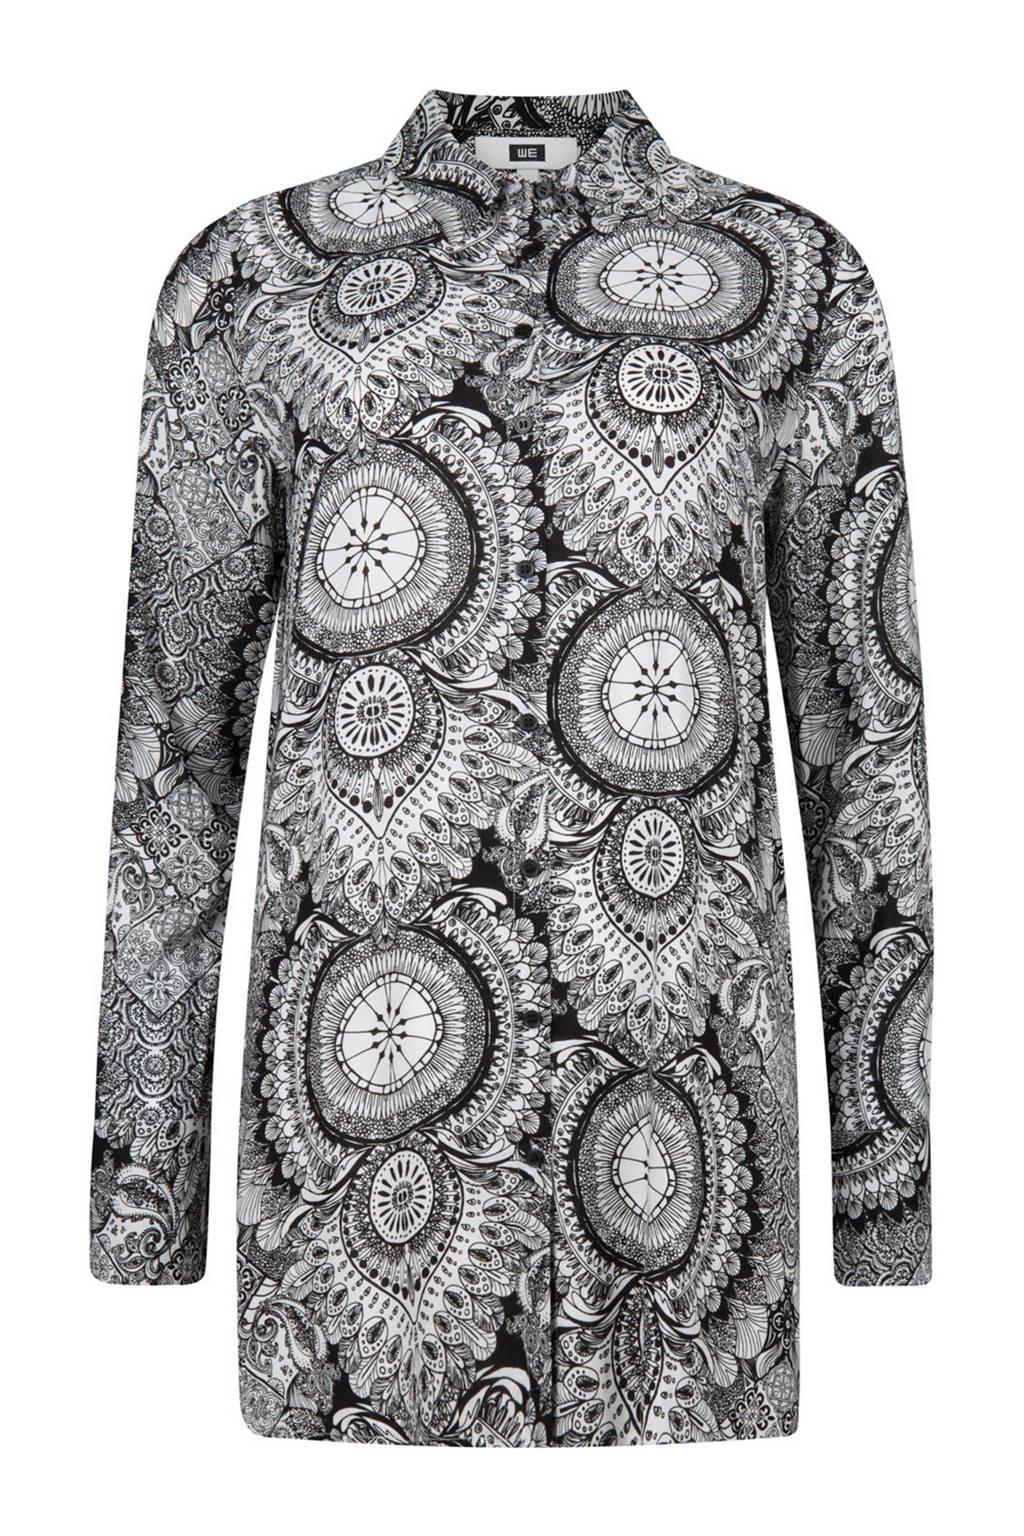 WE Fashion blouse met all over print zwart/wit, Zwart/wit